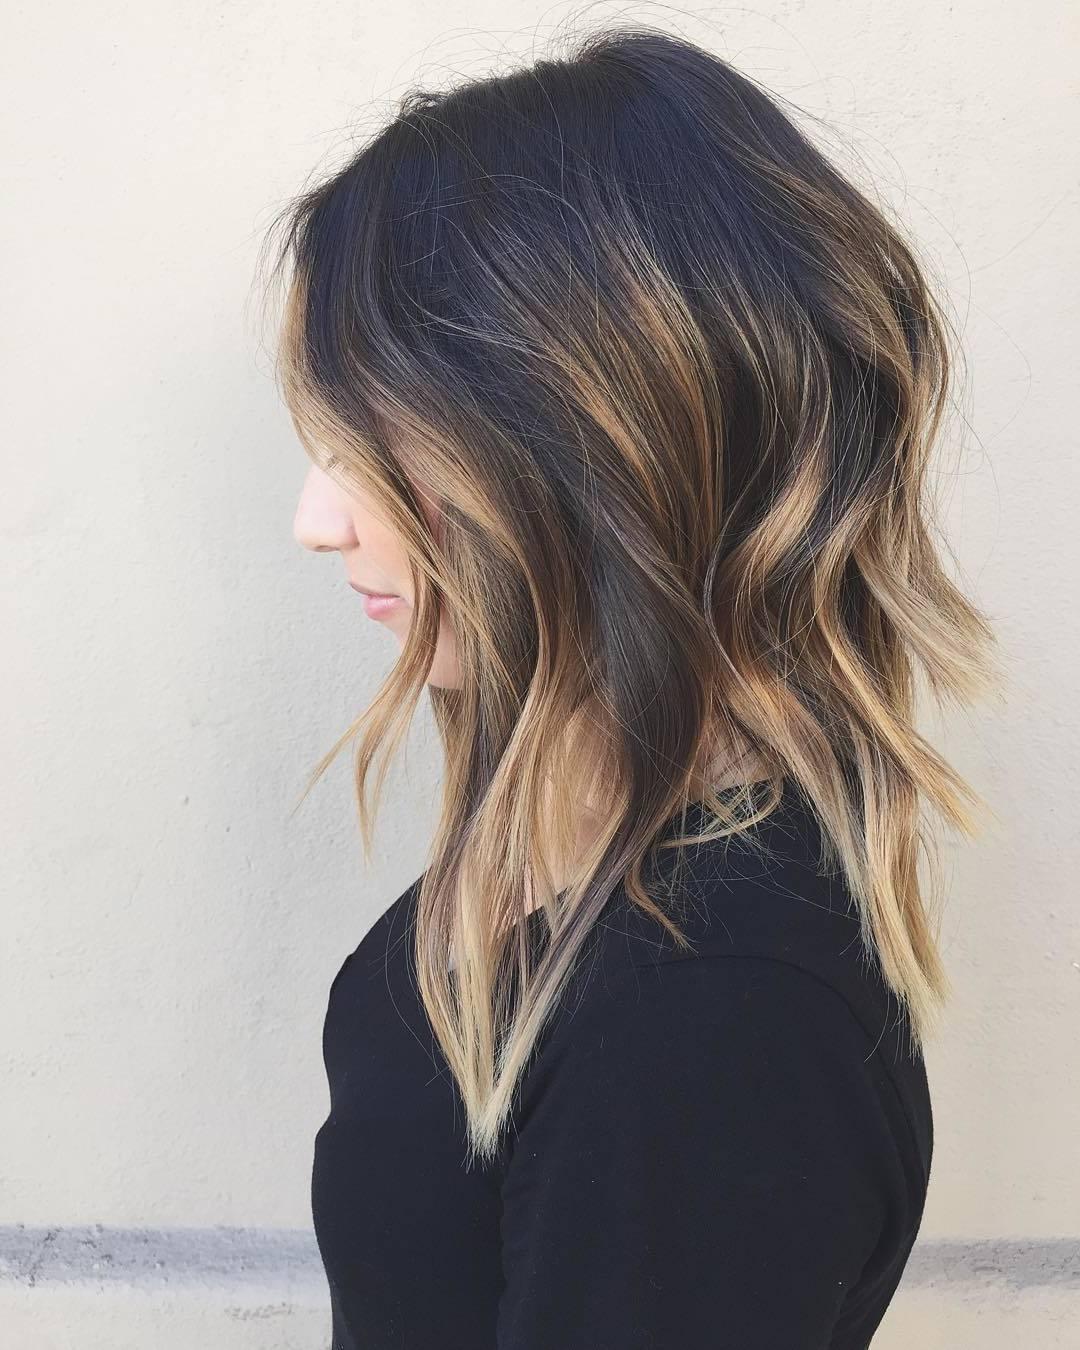 Frisurentrends - Ombre Blond Braun Haar färben